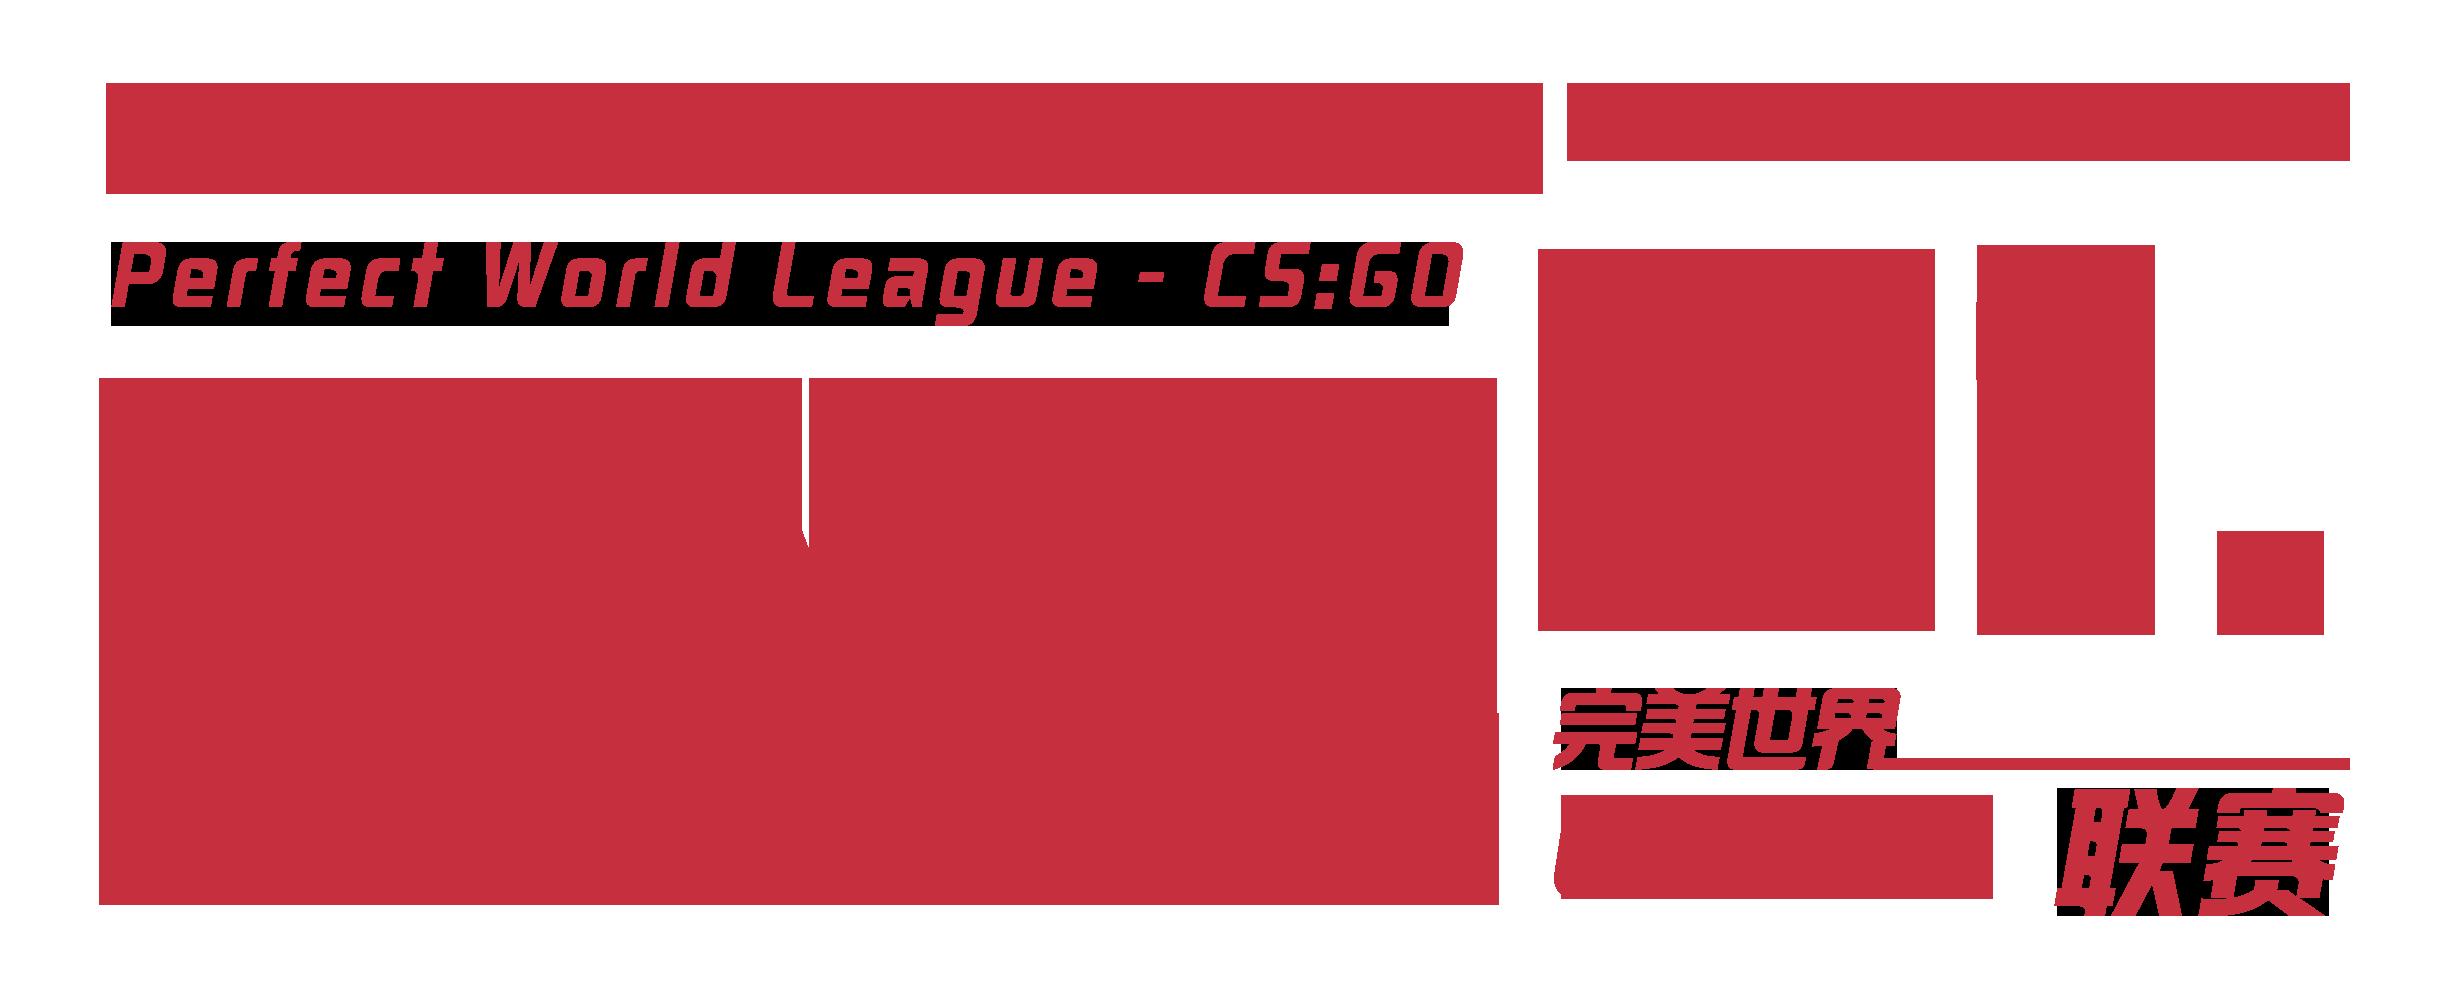 Perfect world league csgo season 1